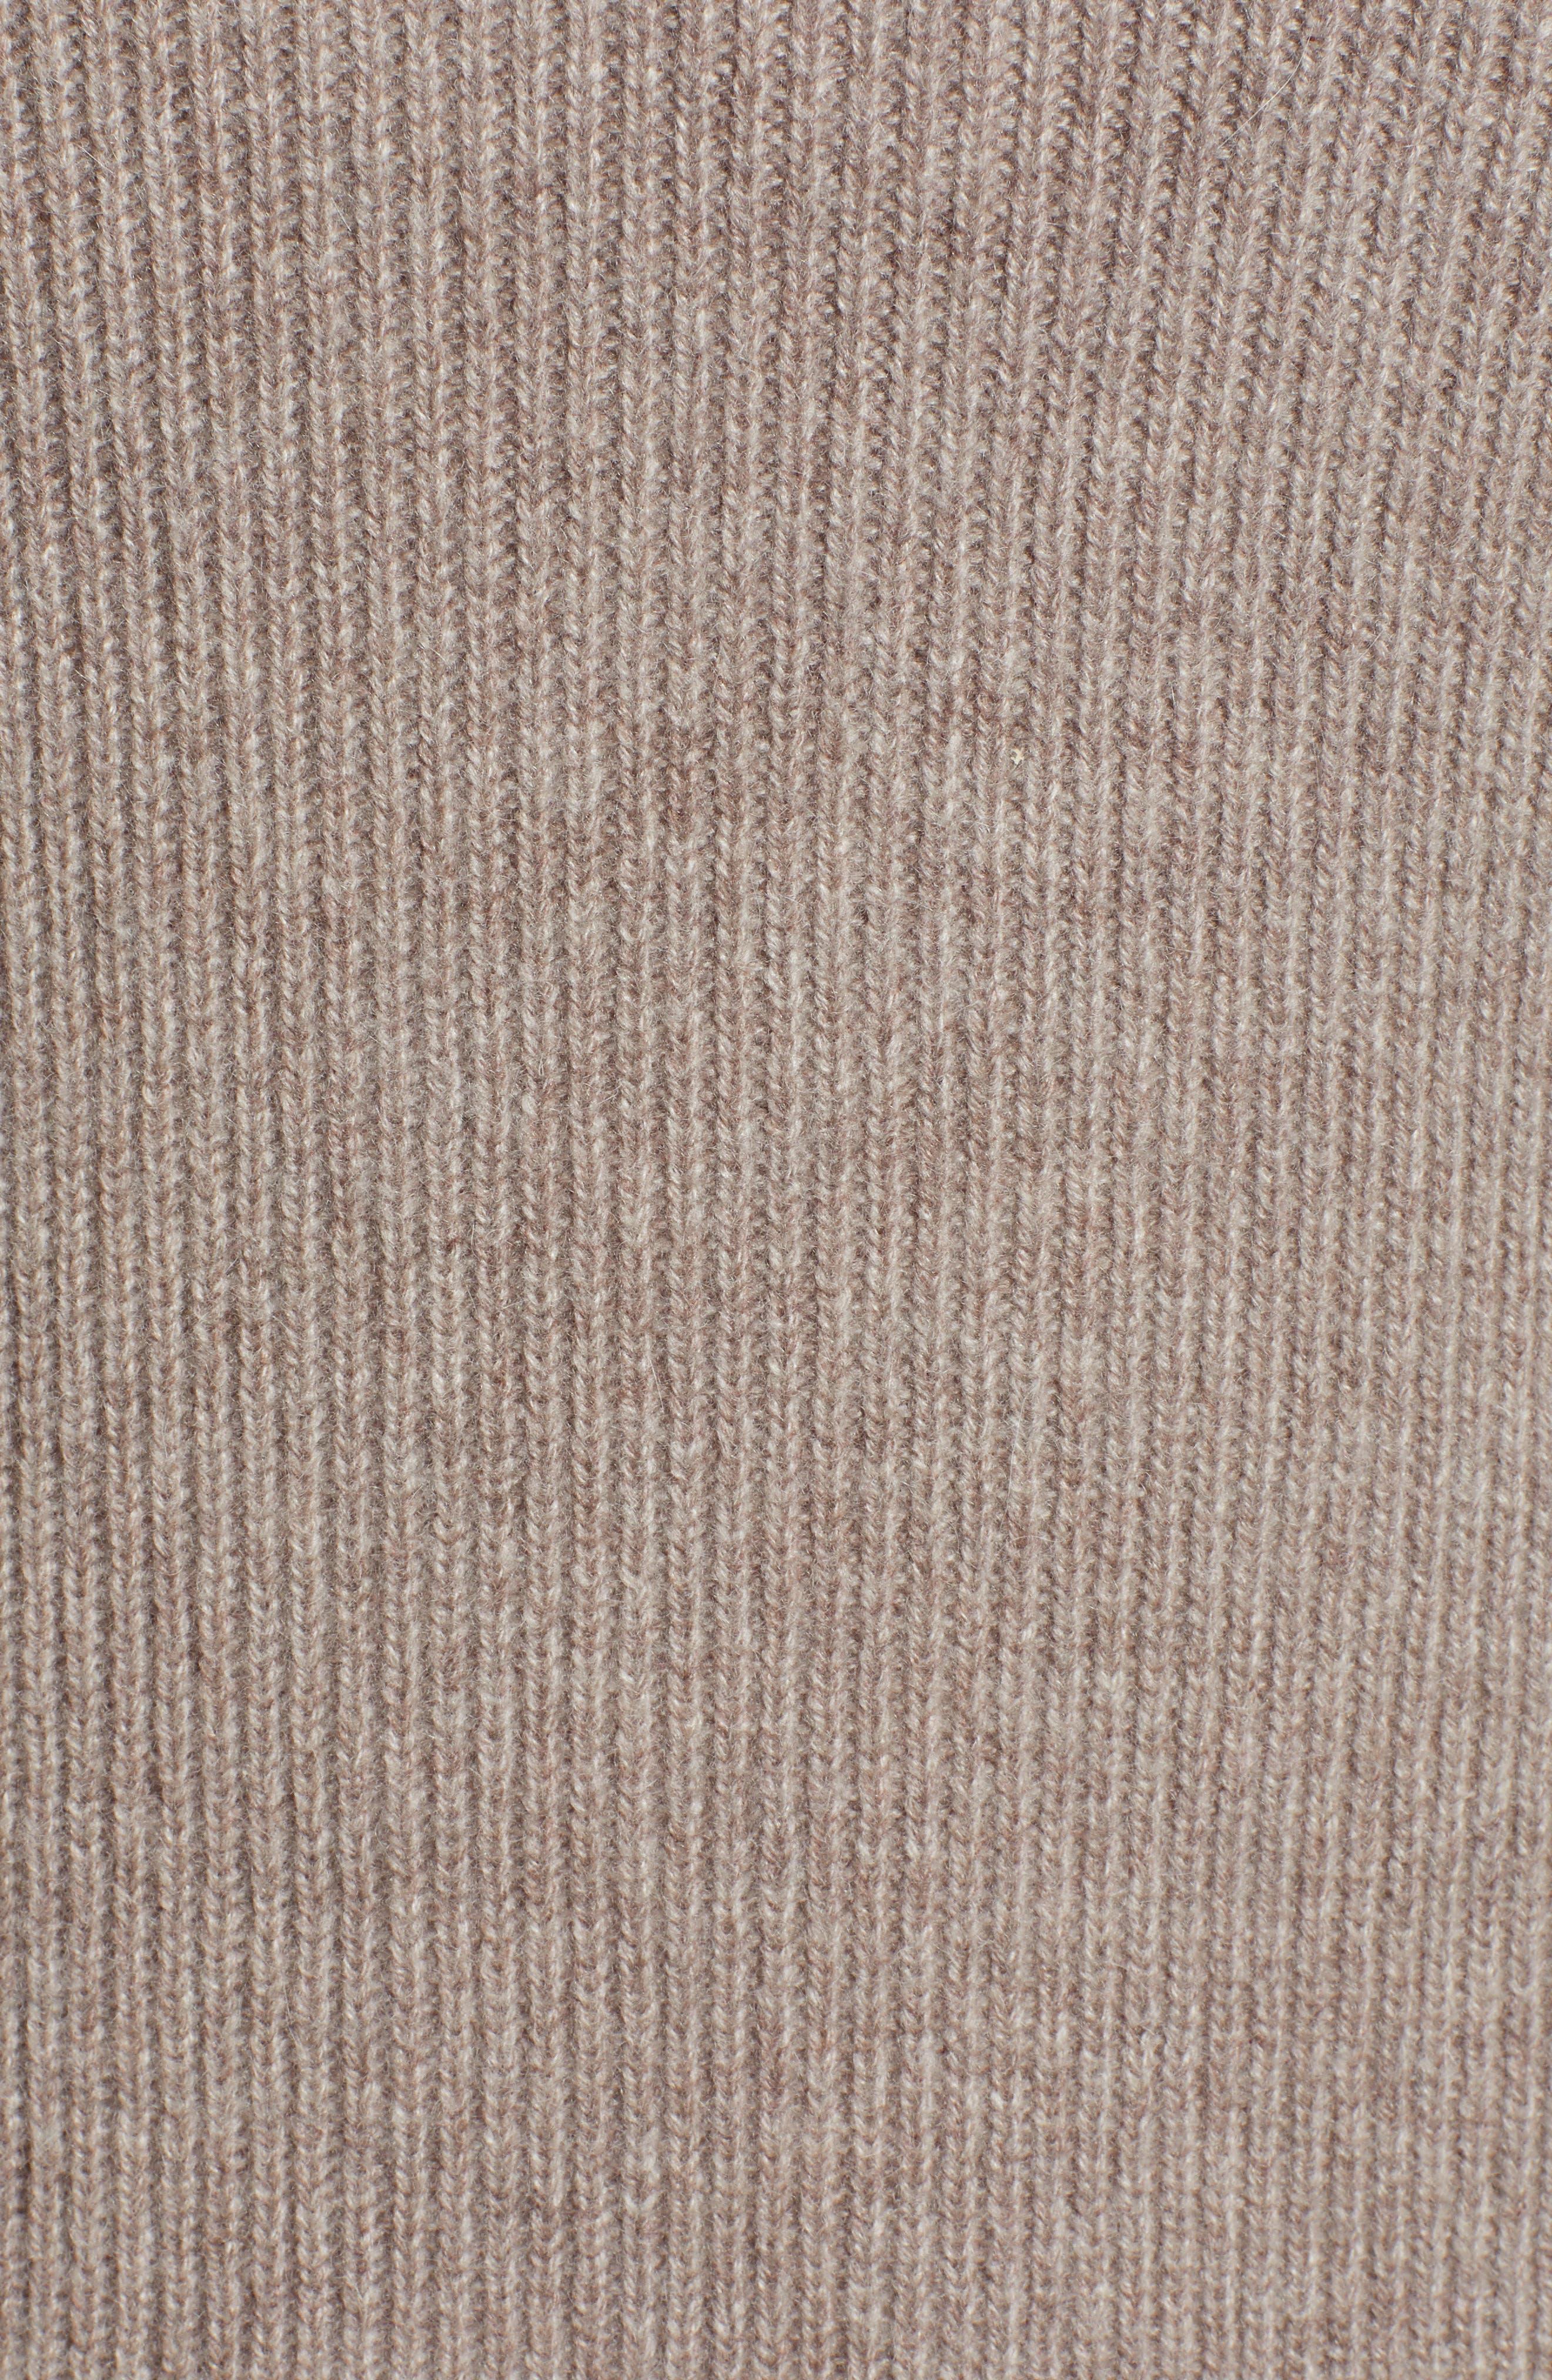 Blouson Sleeve Long Cashmere Cardigan,                             Alternate thumbnail 15, color,